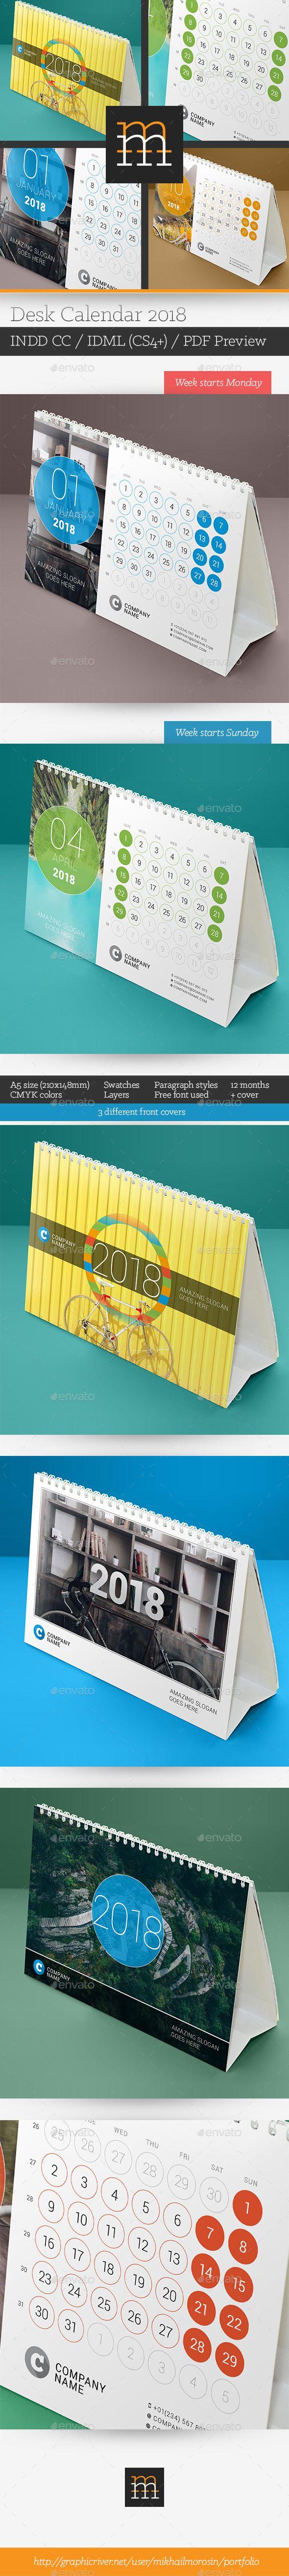 Desk #Calendar 2018 - Calendars #Stationery Download here:  https://graphicriver.net/item/desk-calendar-2018/20248878?ref=alena994